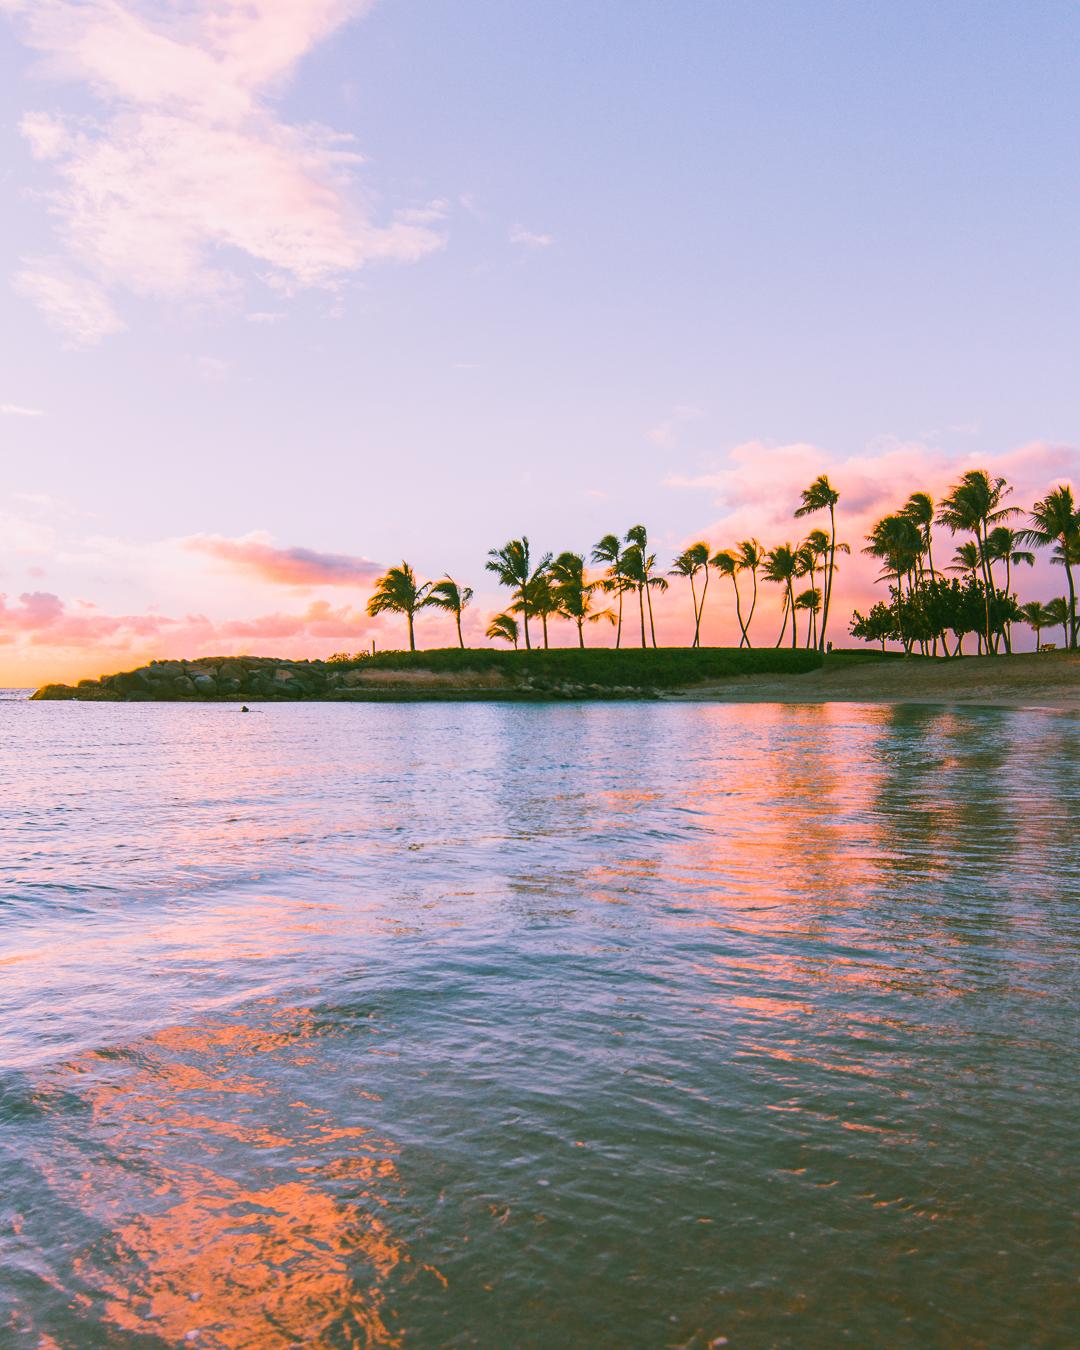 Sunset at Koolina - West Oahu 10 Best Things